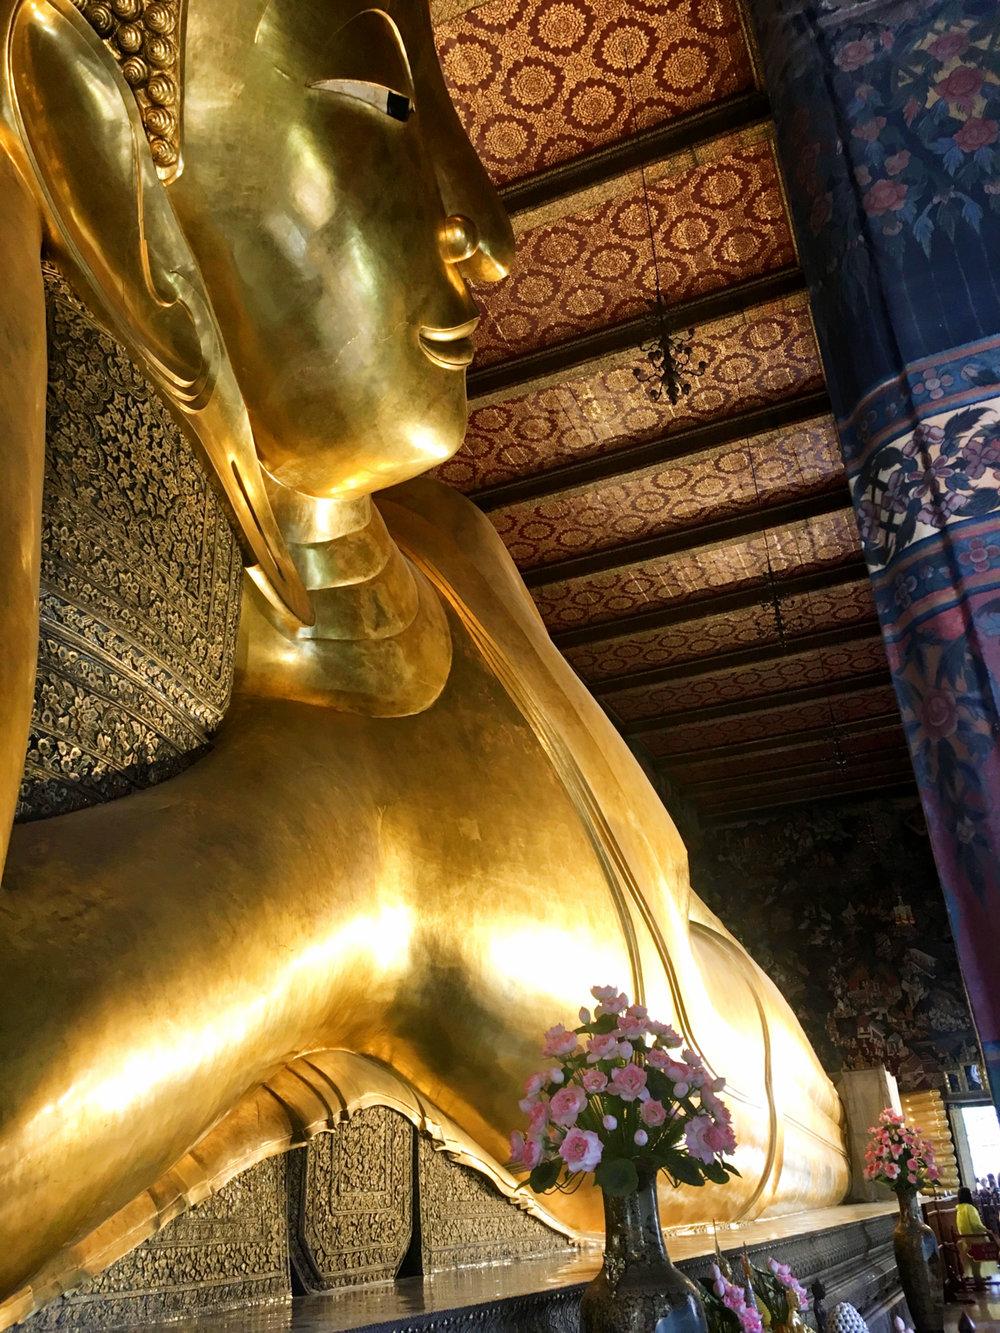 Side view of large reclining Buddha in Bangkok